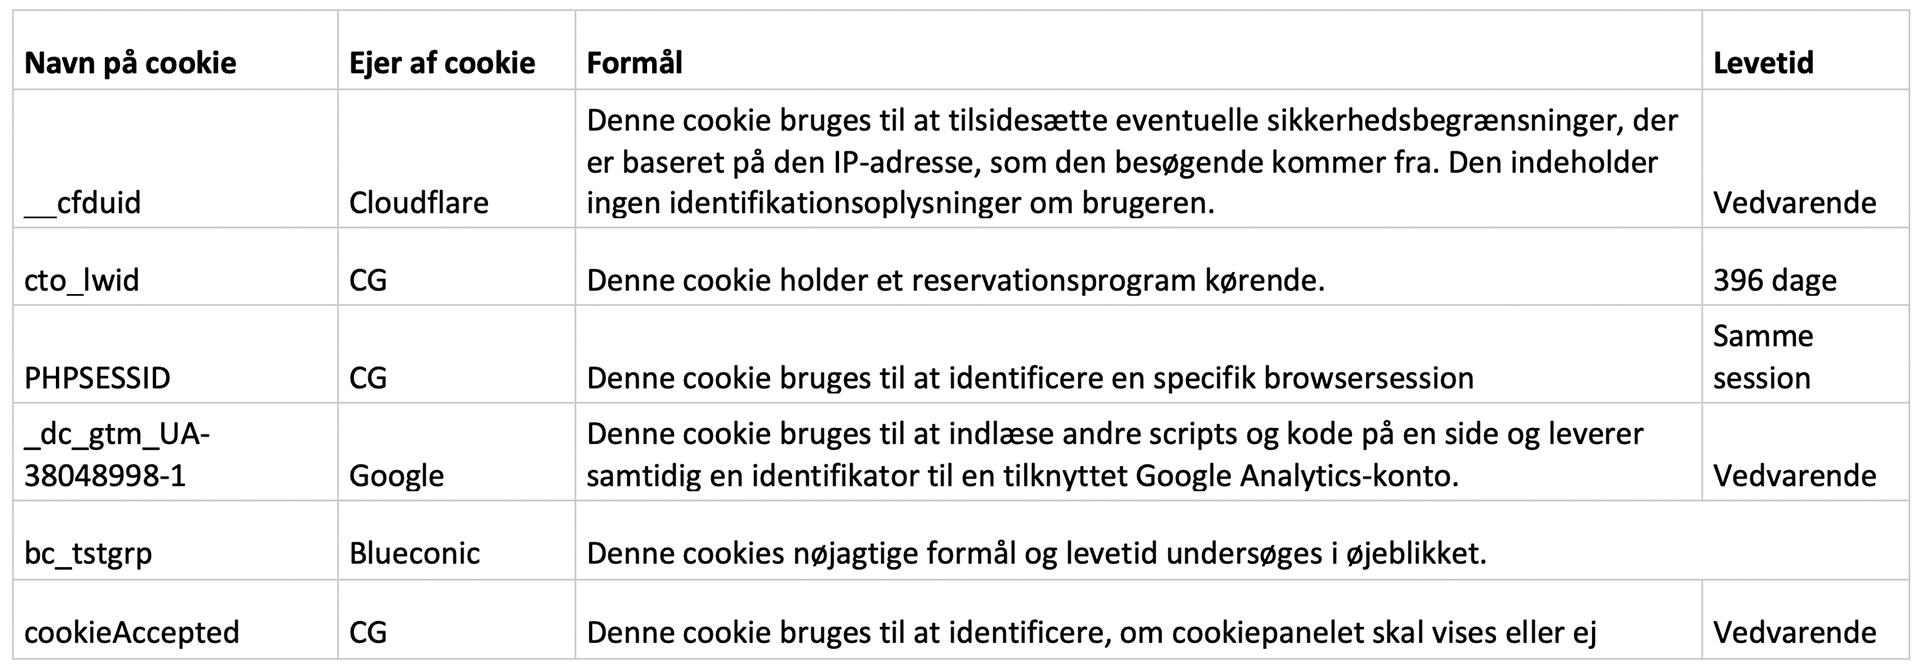 Erklæring om cookies